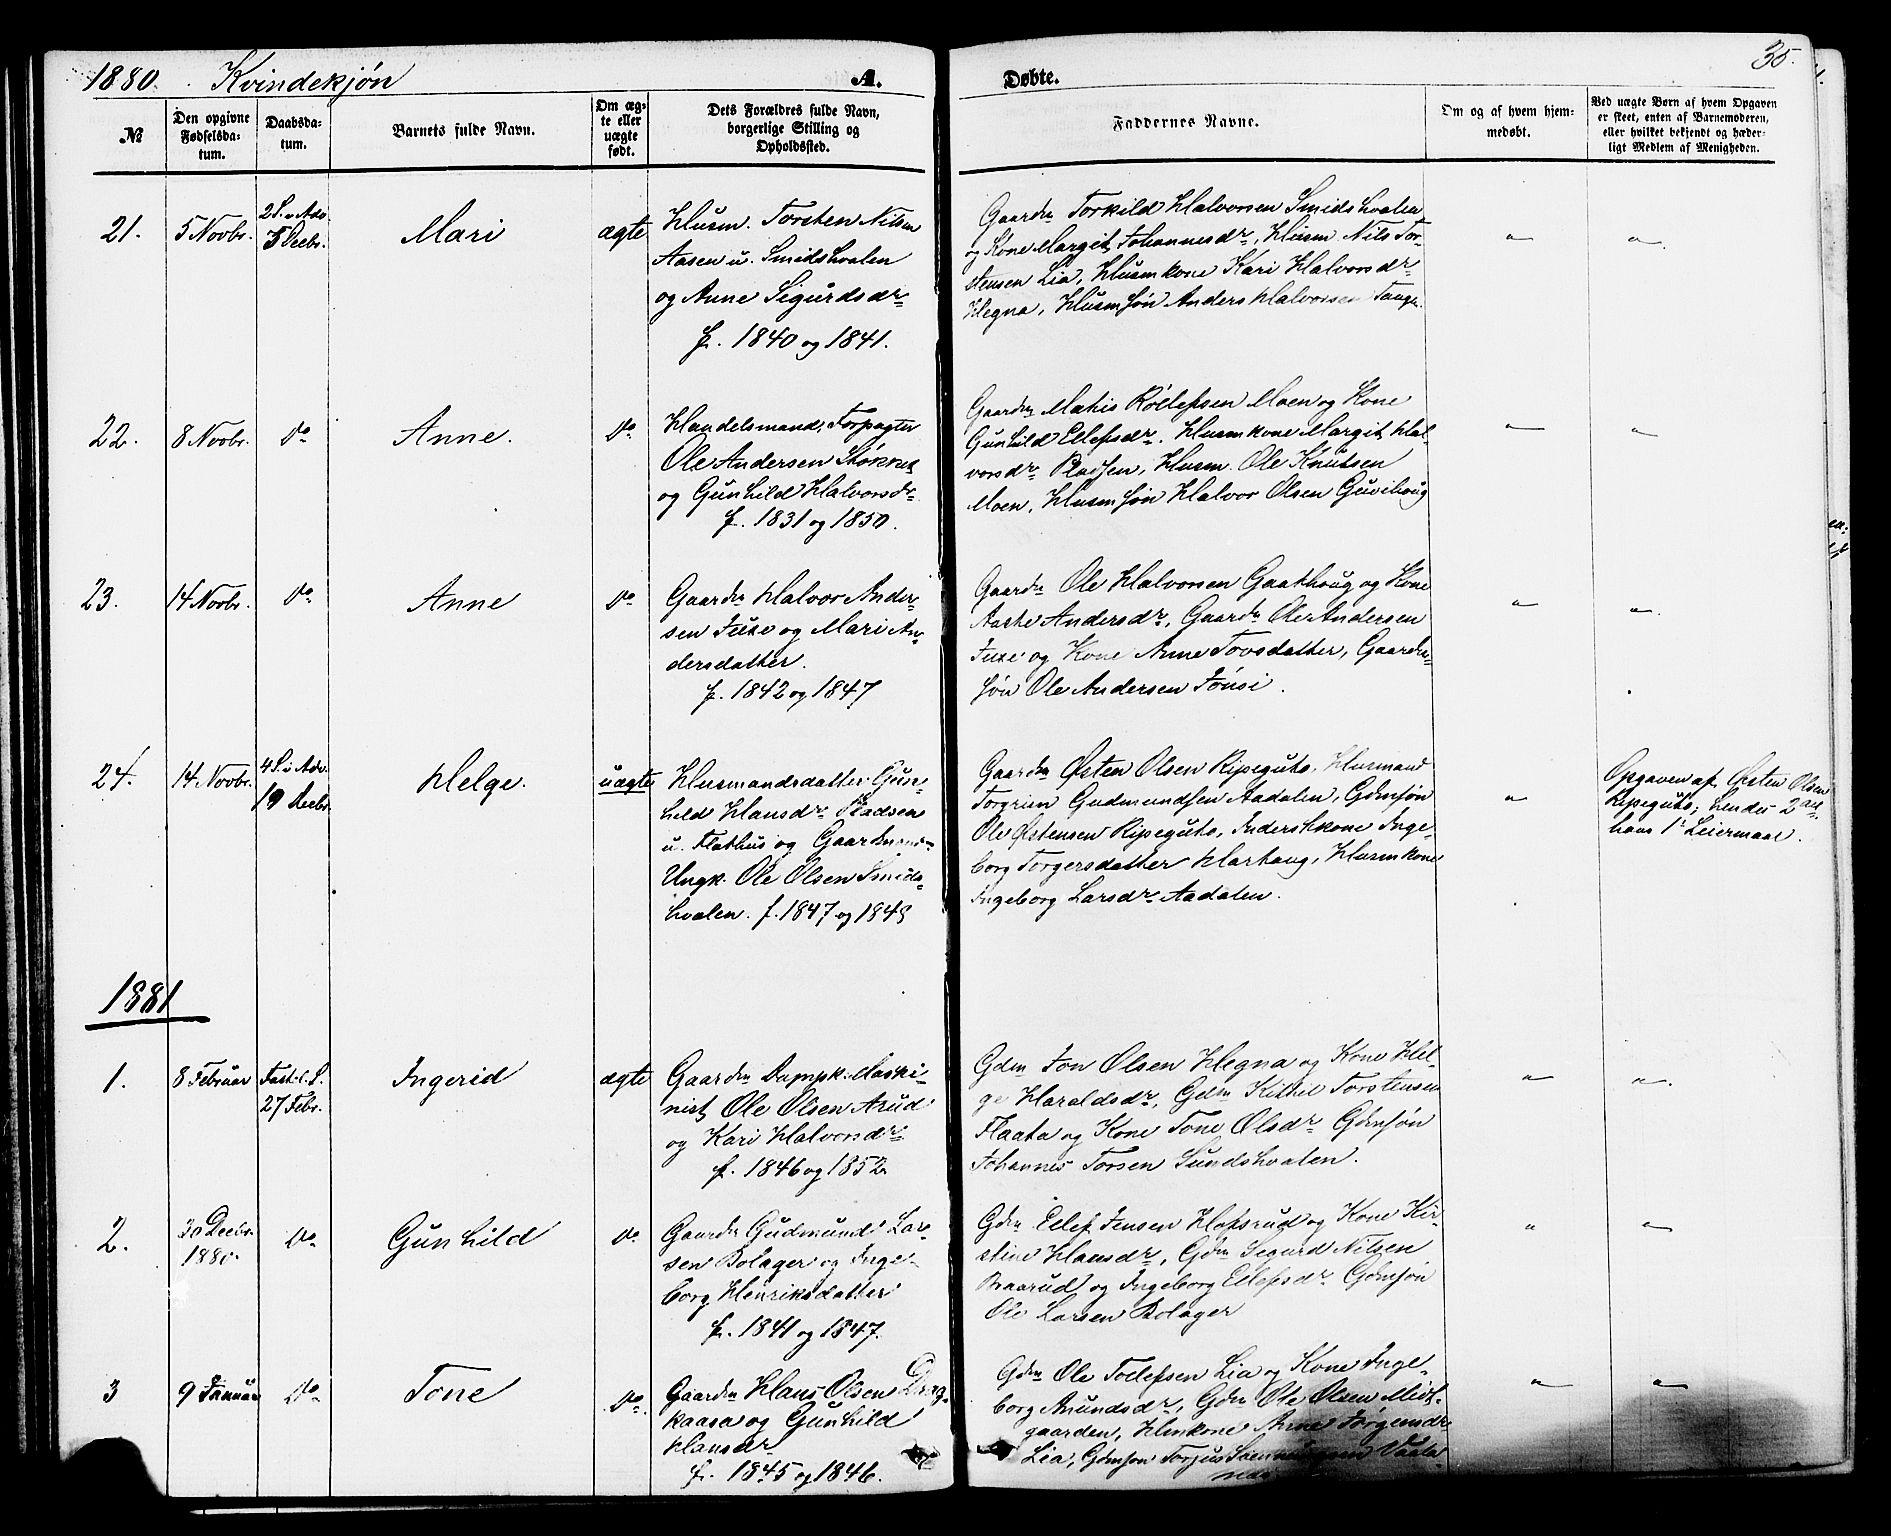 SAKO, Sauherad kirkebøker, F/Fa/L0008: Ministerialbok nr. I 8, 1873-1886, s. 35